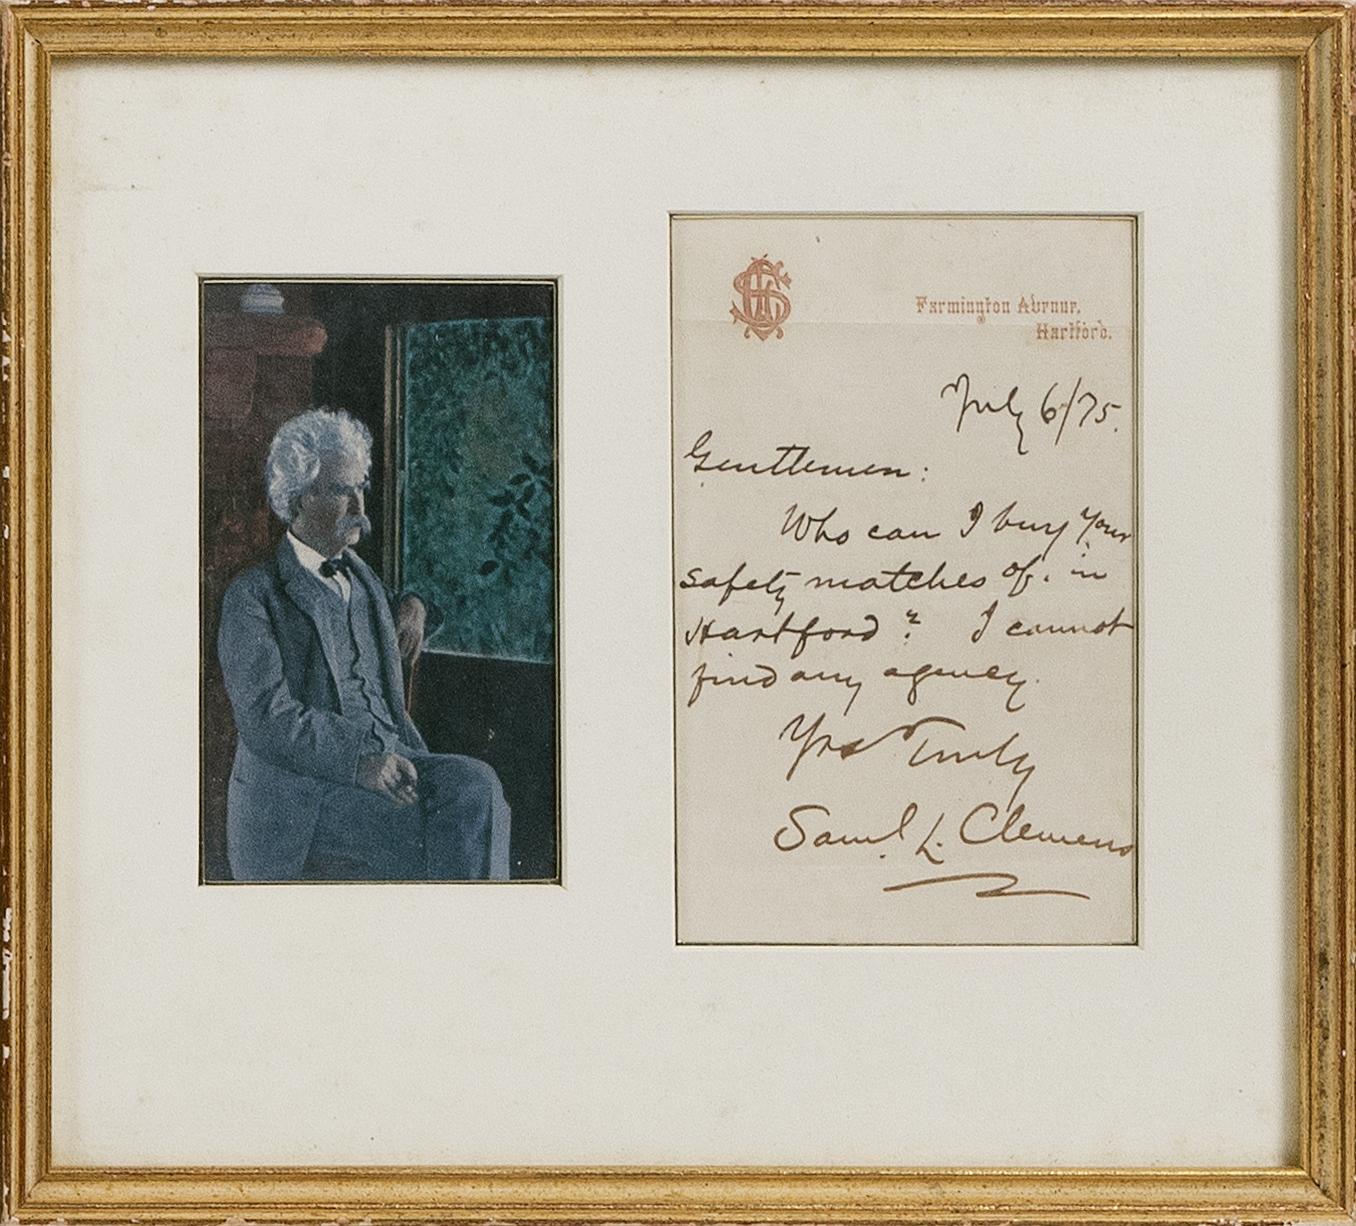 SAMUEL LANGHORNE CLEMENS (MARK TWAIN) ALS July 6th, 1875 Letter 9.5